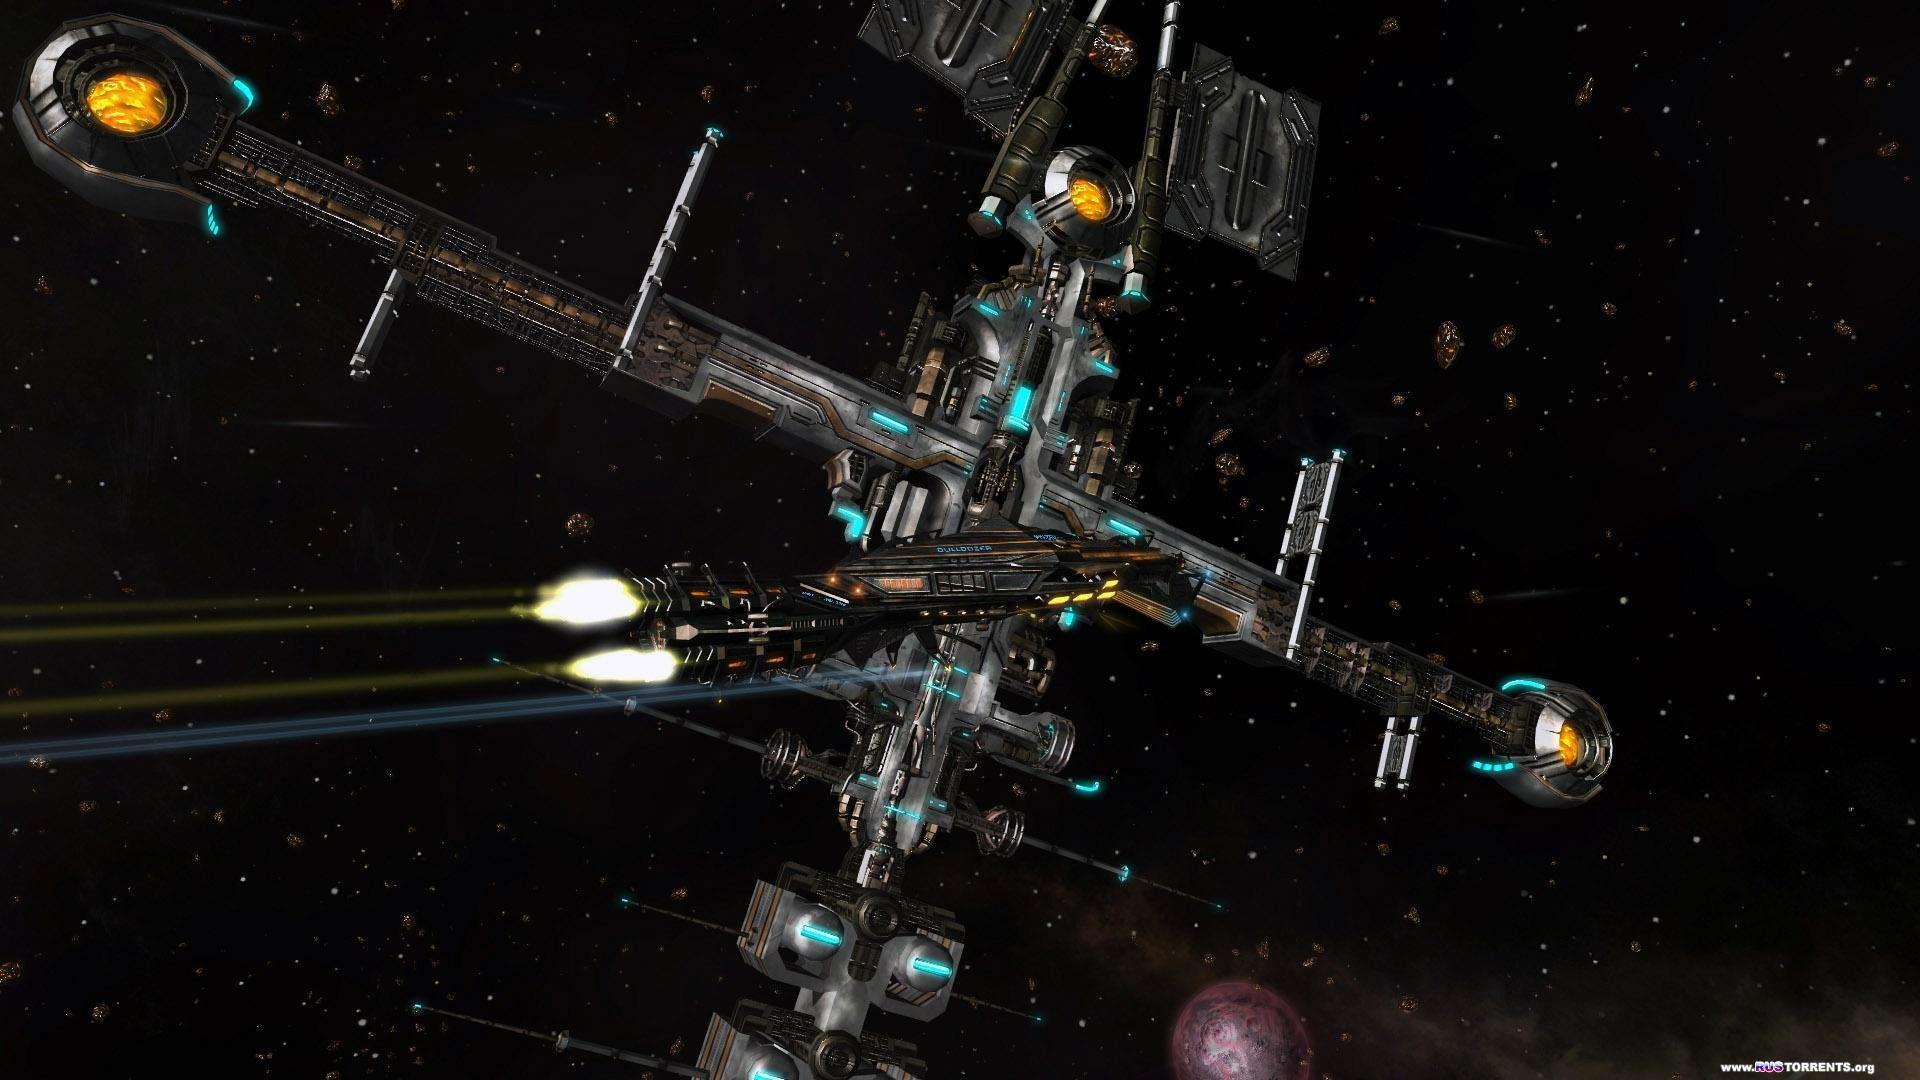 Starpoint Gemini 2 [v 1.9 + 3 DLC] | PC | RePack от R.G. Механики